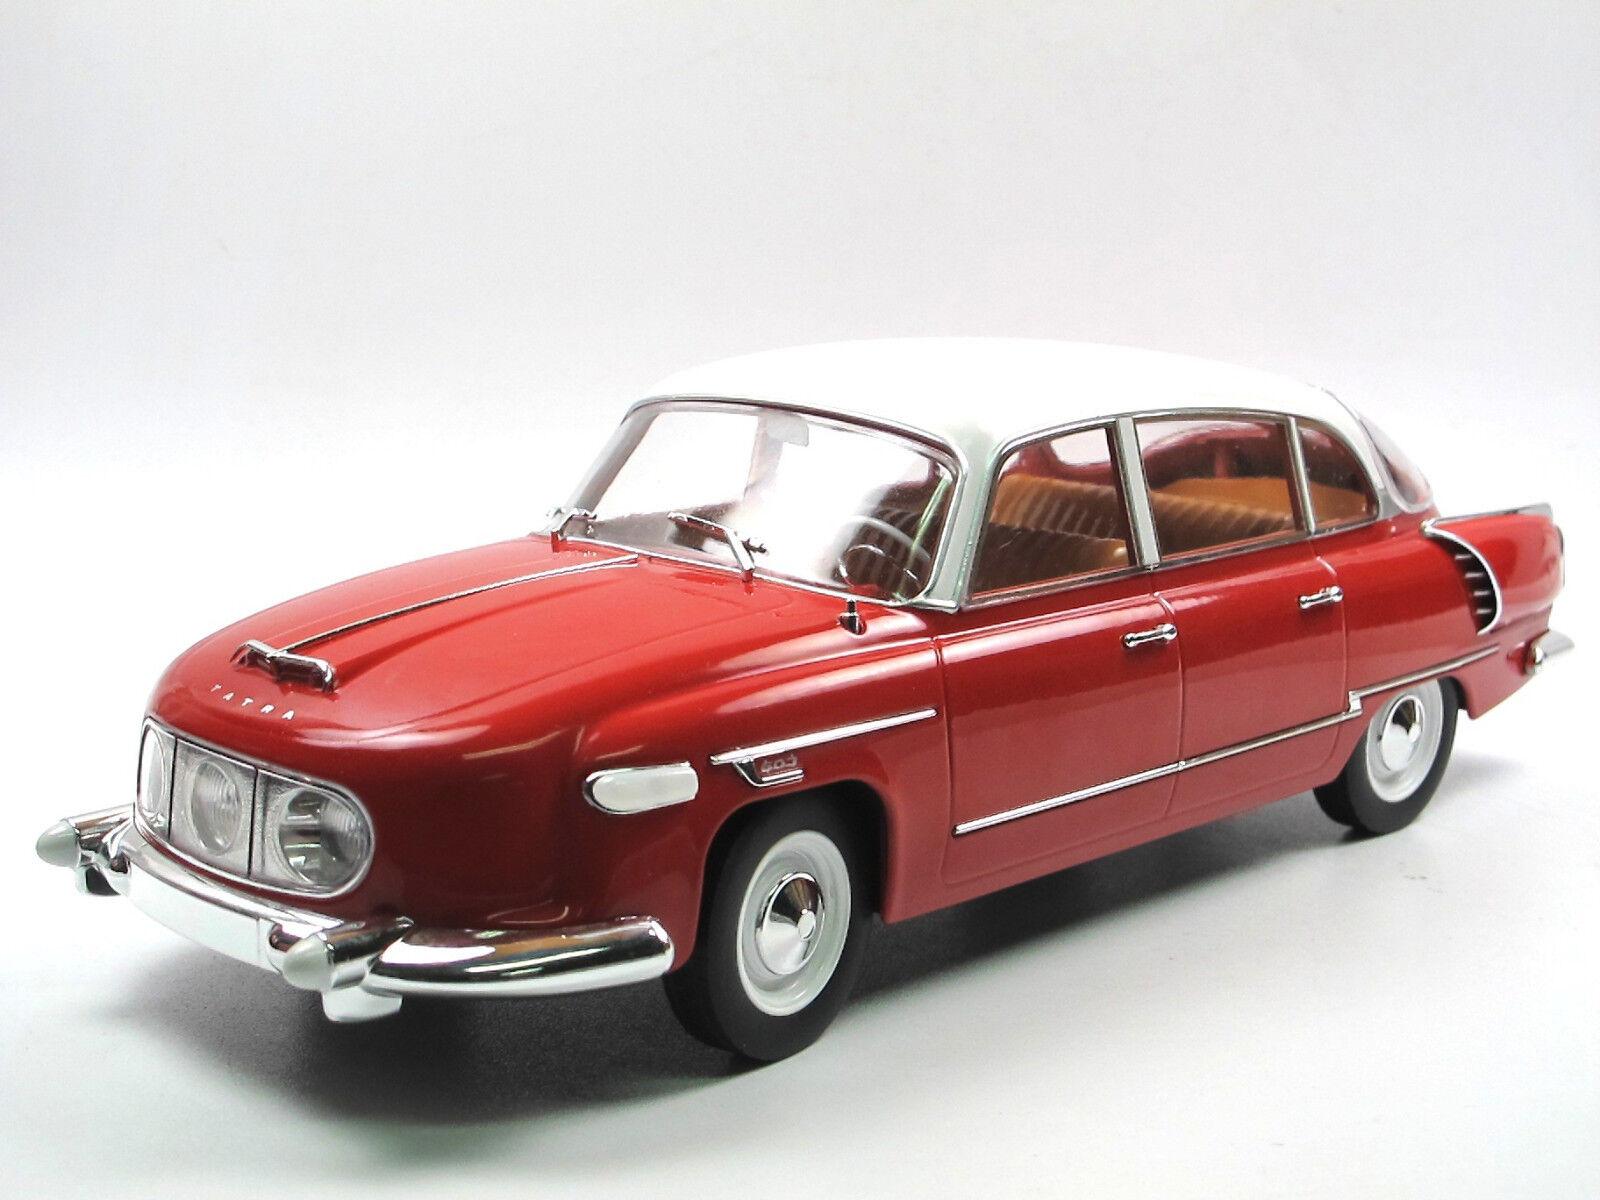 FOXtoys-Tatra 603 1 1 1 - Année 1957-Rouge Blanc - 1 18 Limited Edition 500 ed469a